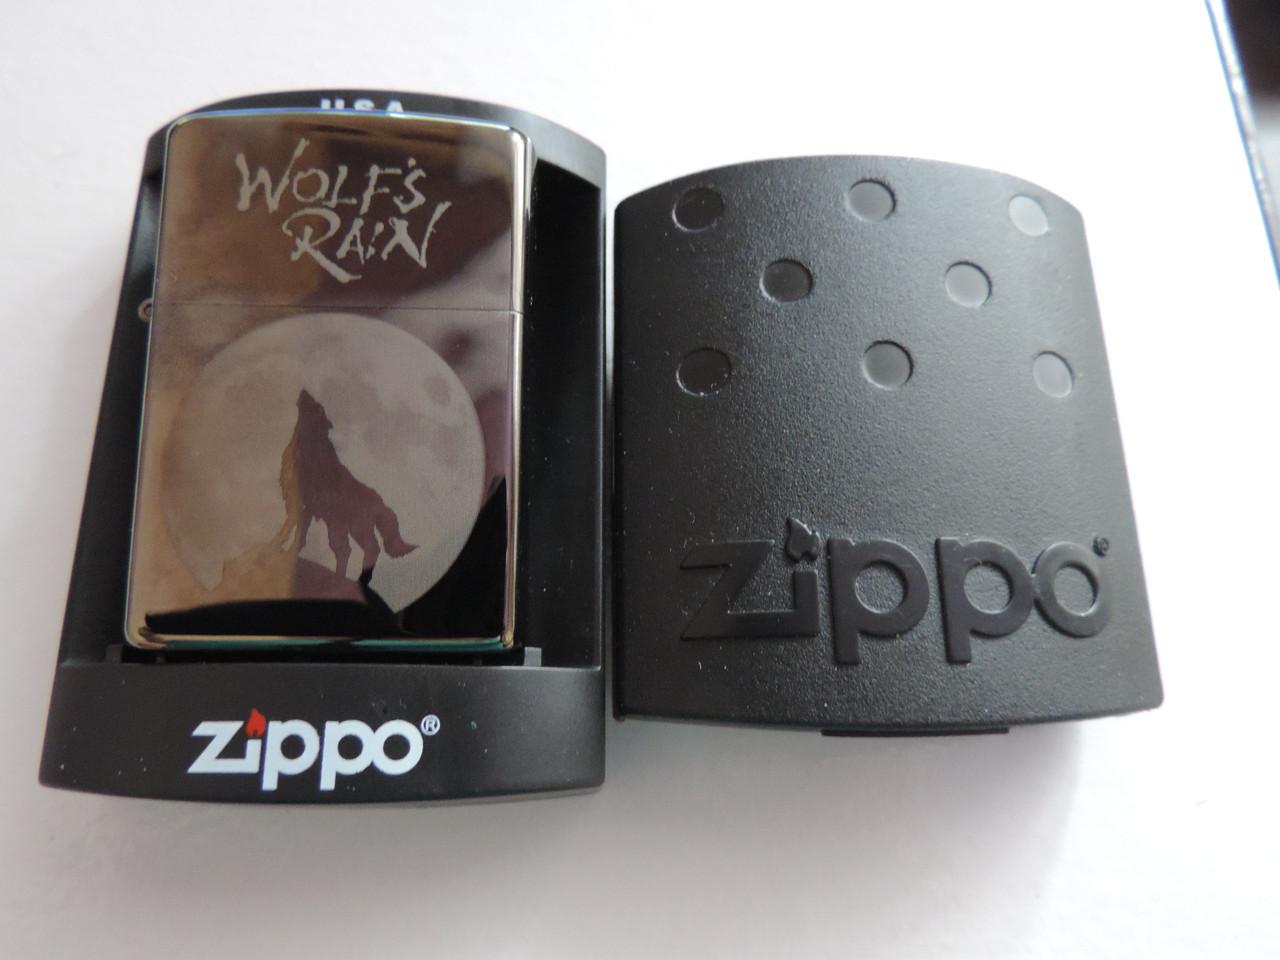 Зажигалка бензиновая Zippo (Зиппо) -«Wolfs-Rain» копия